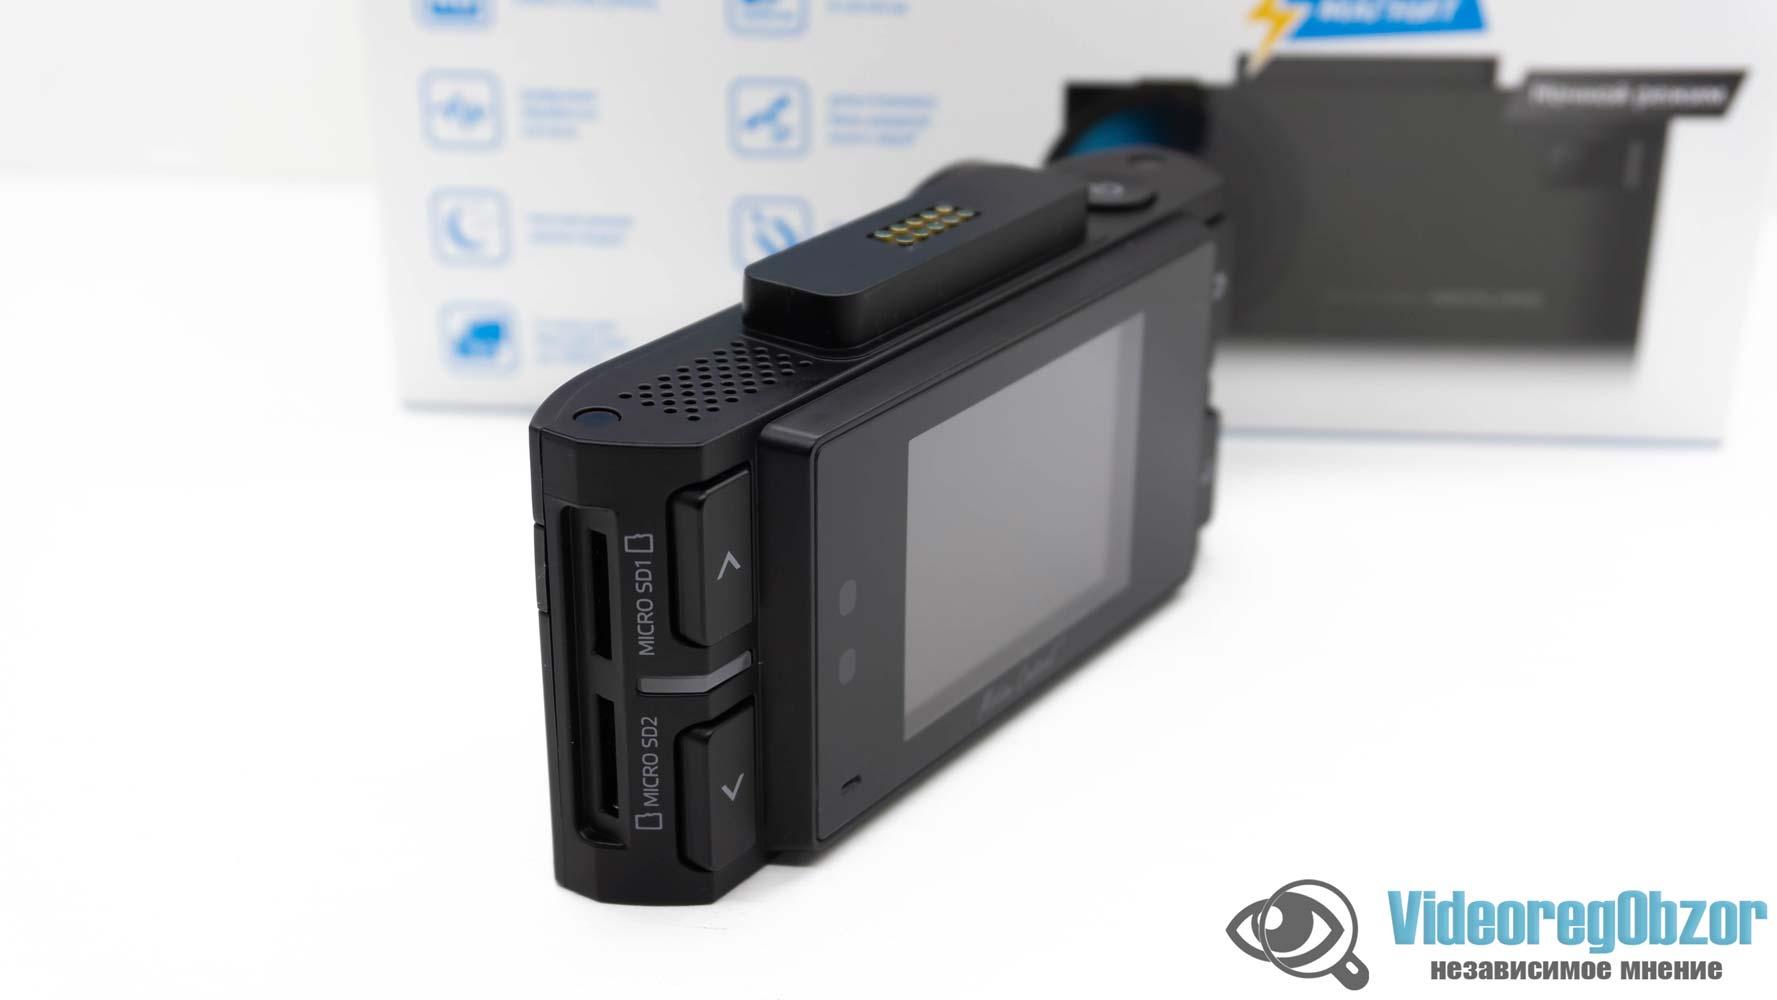 Neoline X COP 9200 обзор 14 VideoregObzor Neoline X-COP 9200: обзор видеорегистратора с радар-детектором